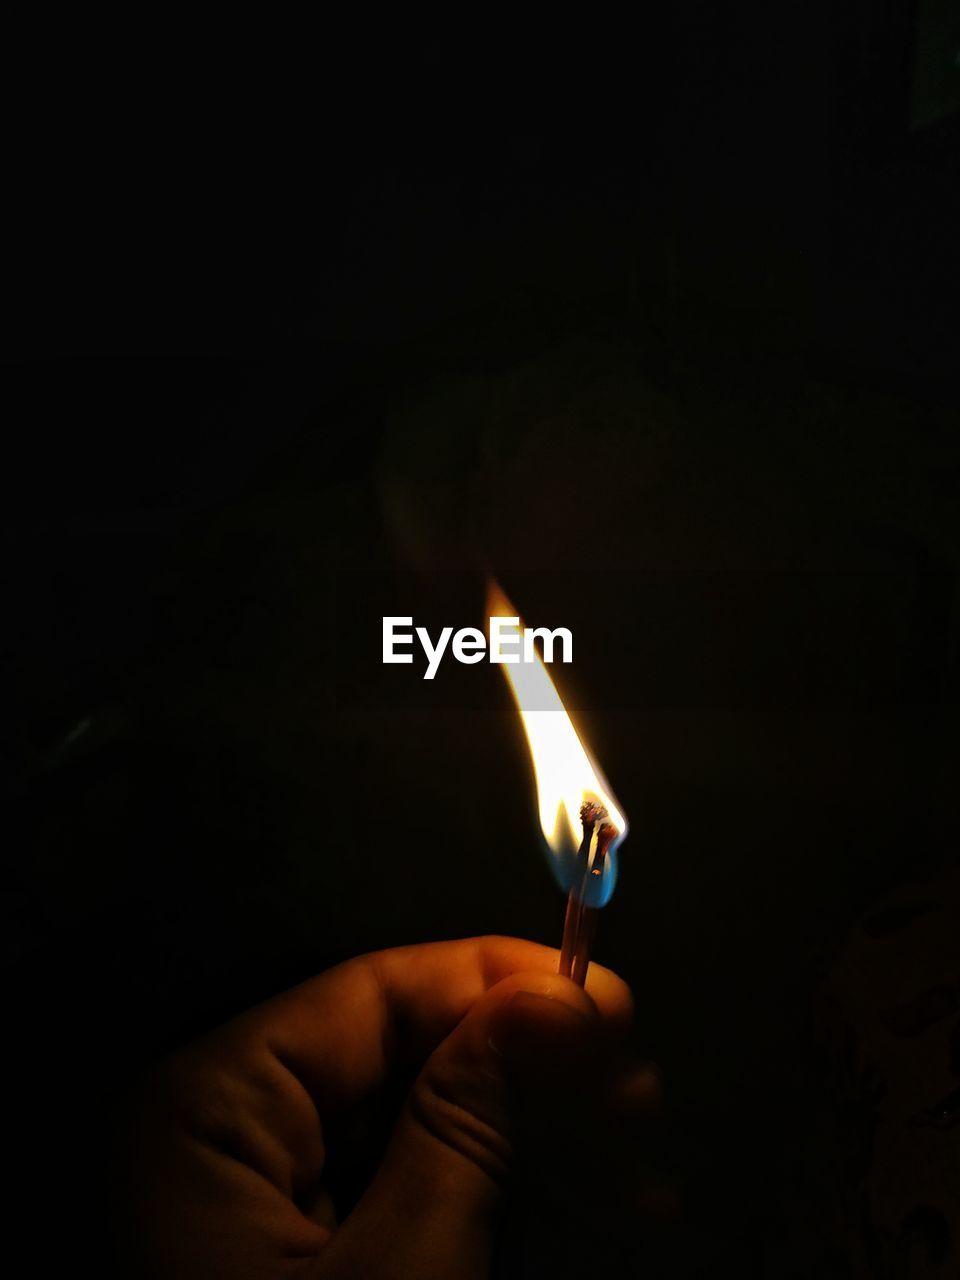 Close-up of hand holding burning matchstick over black background